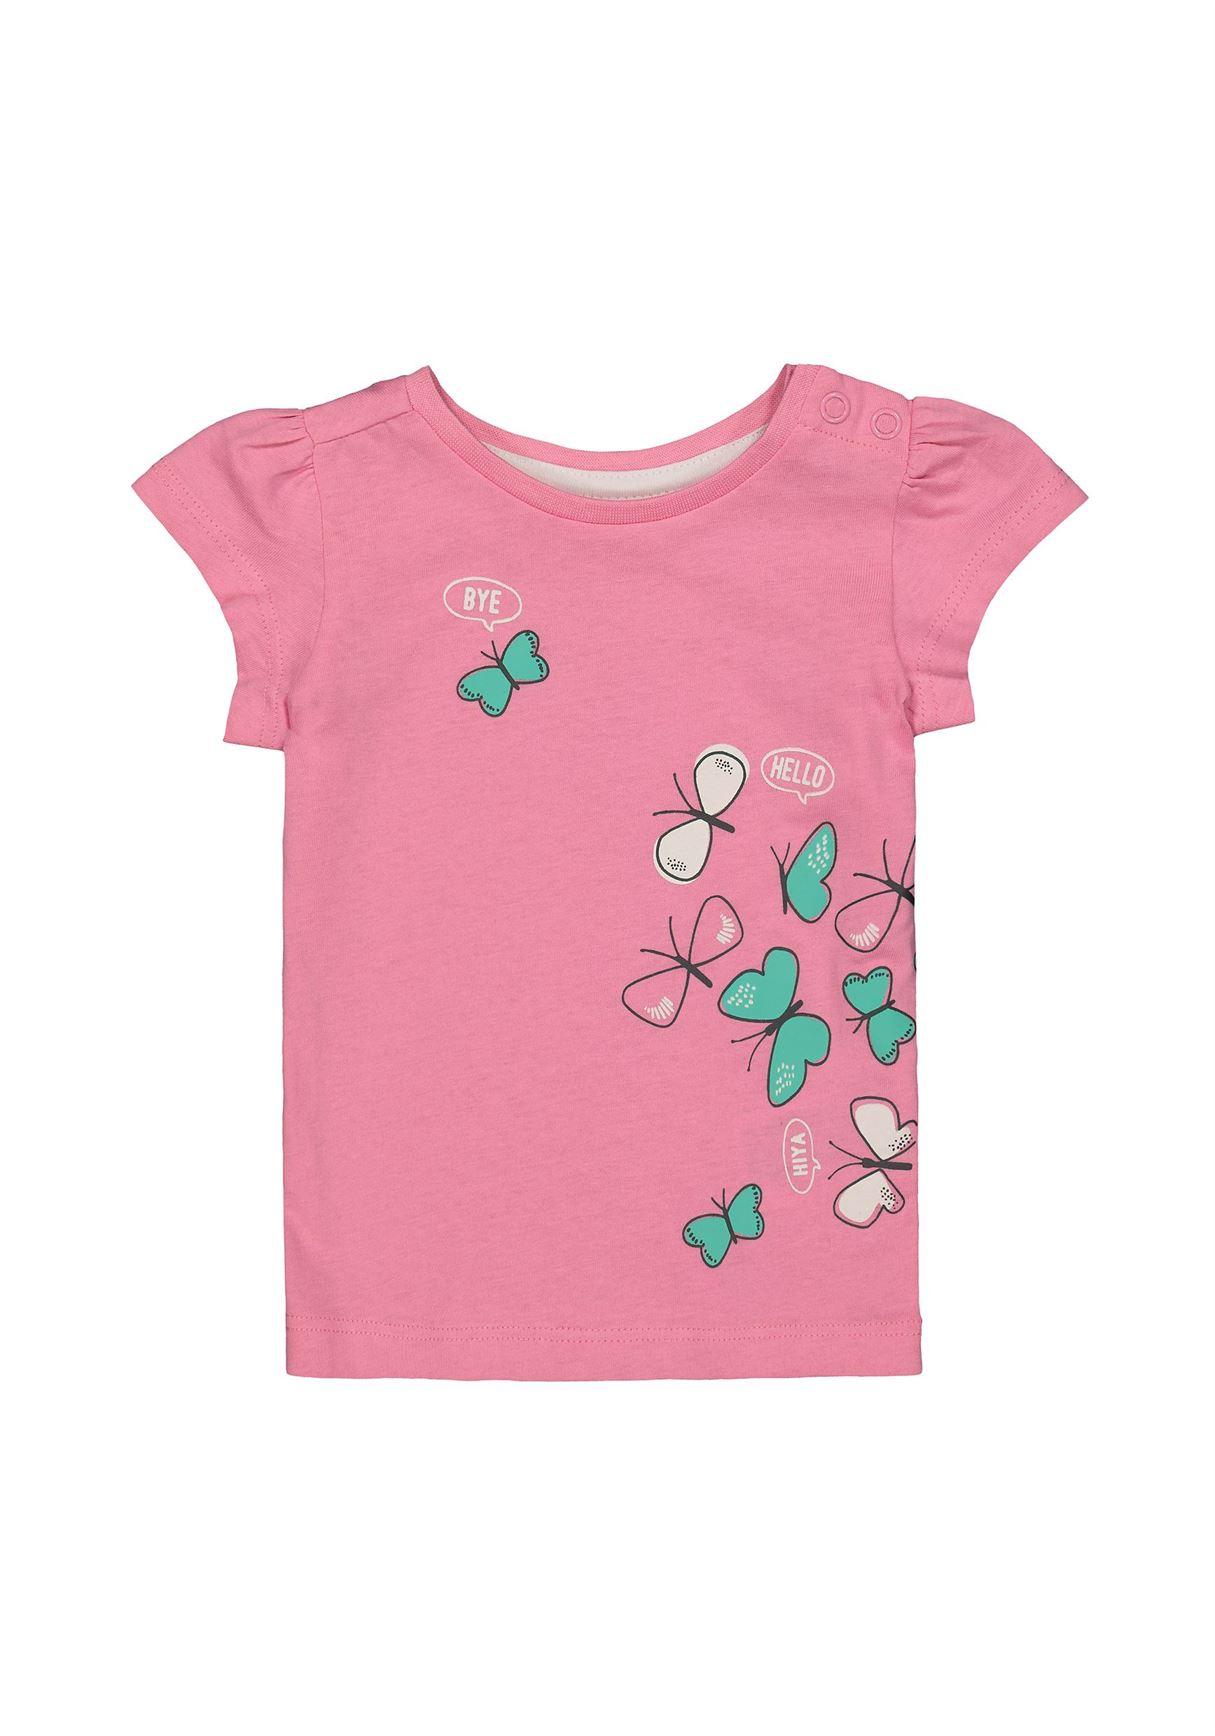 Mothercare Girls Pink Printed T-Shirt